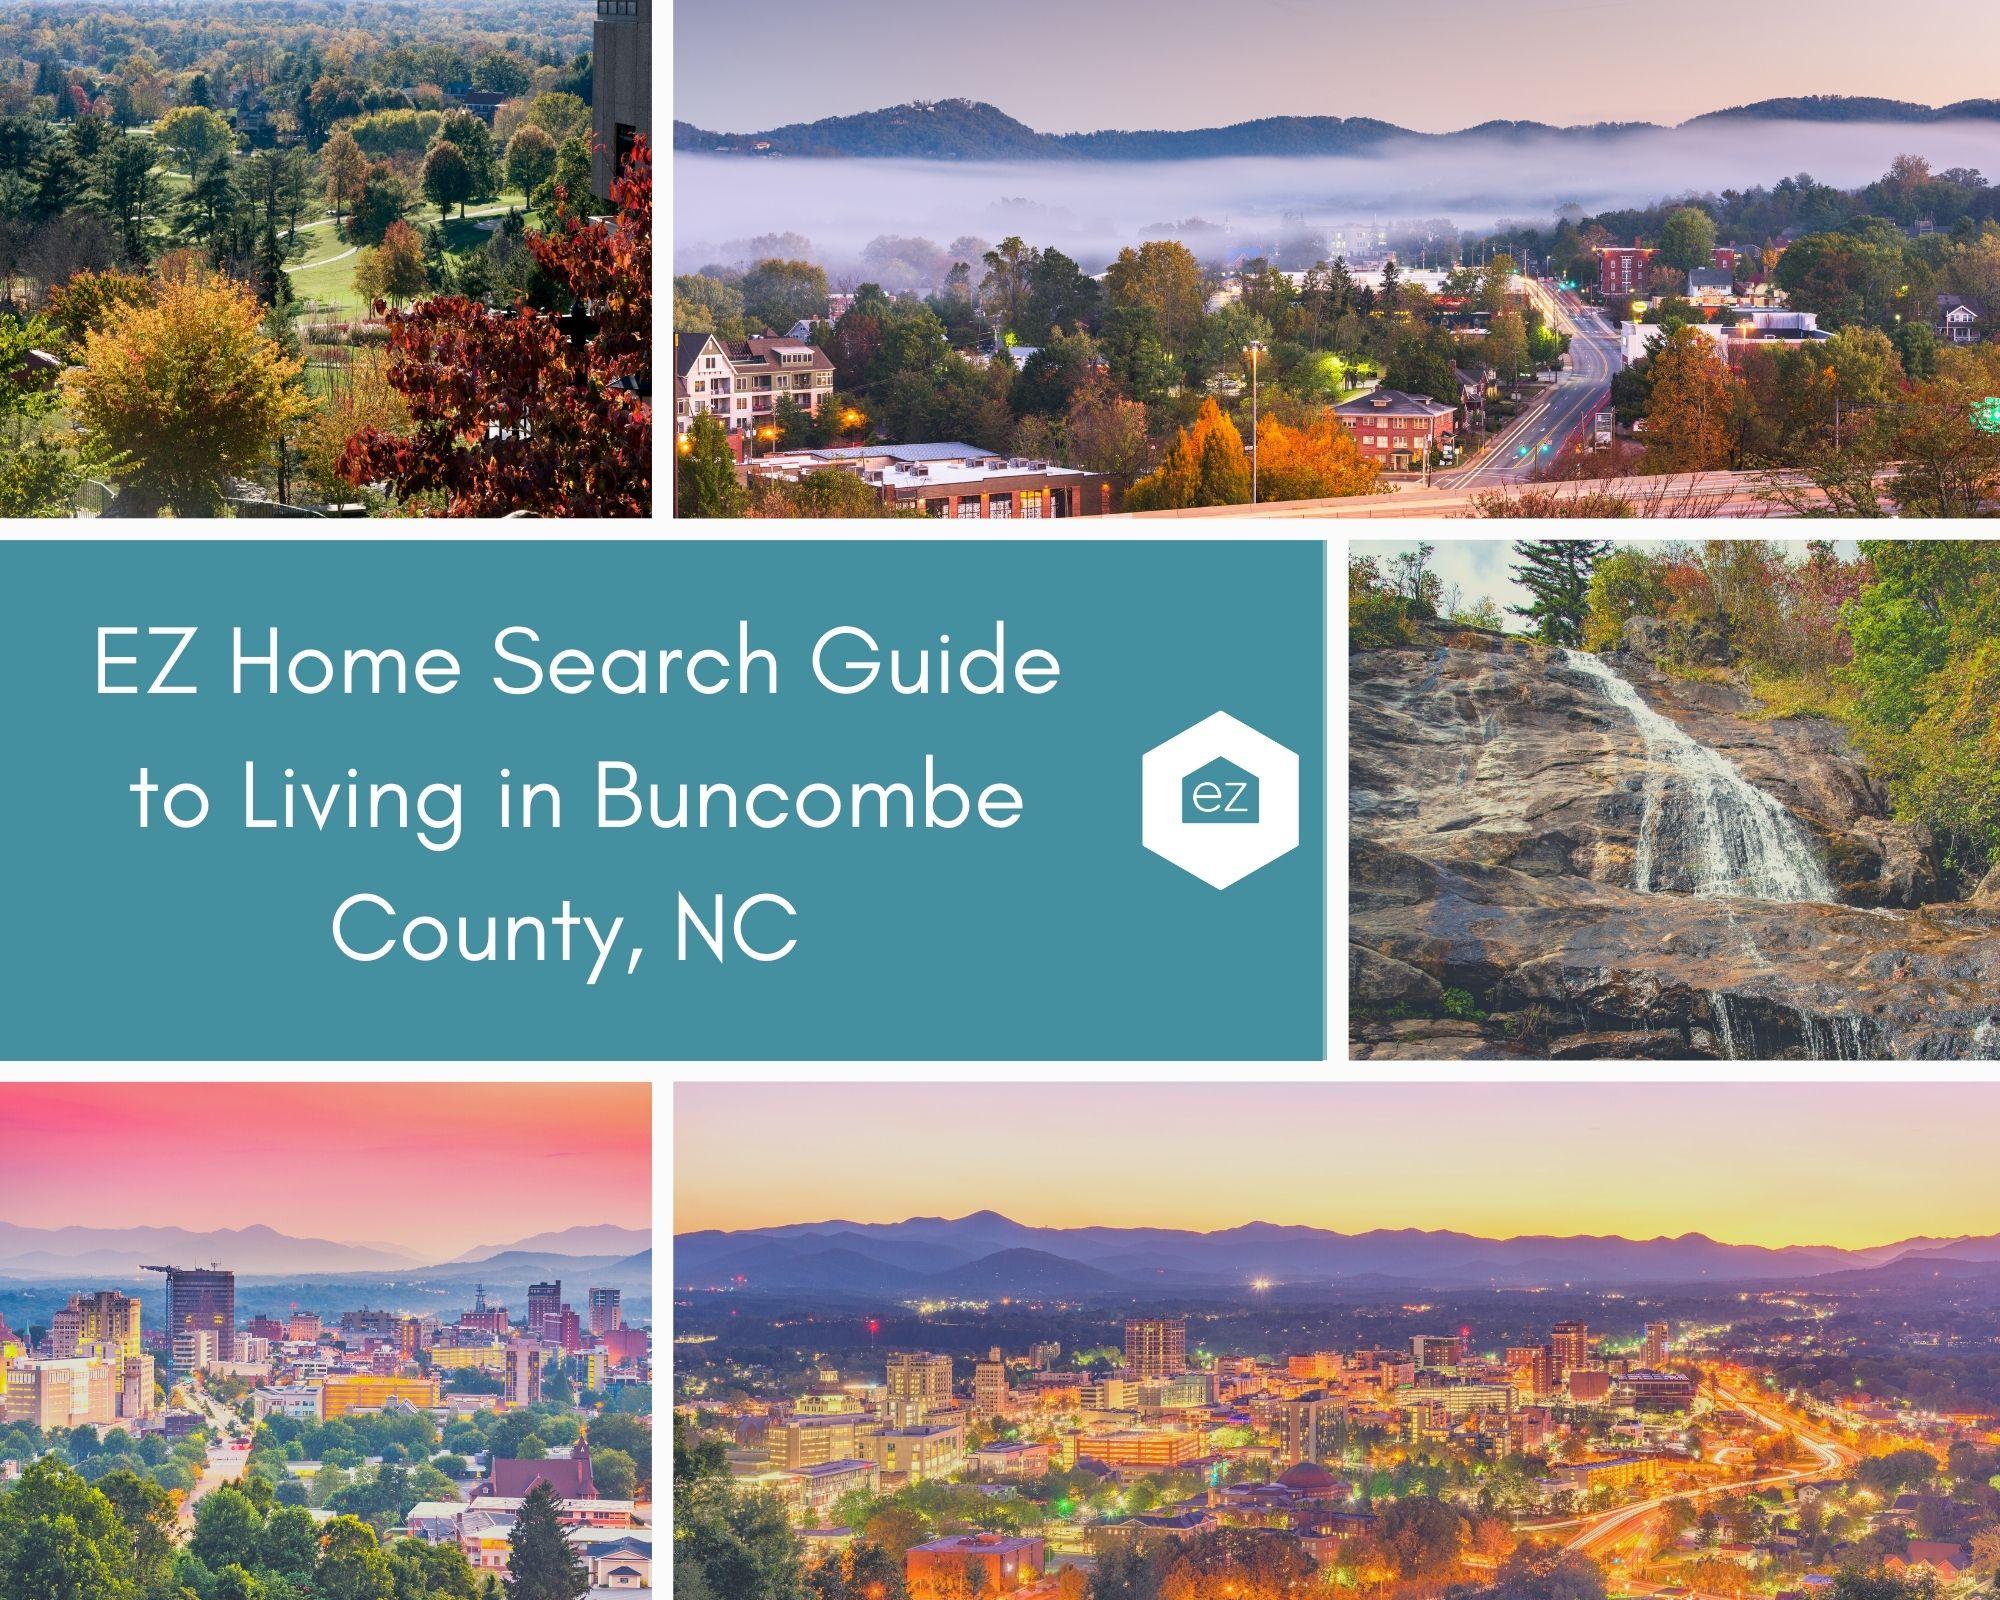 Photos of Buncombe County, and Asheville, North Carolina